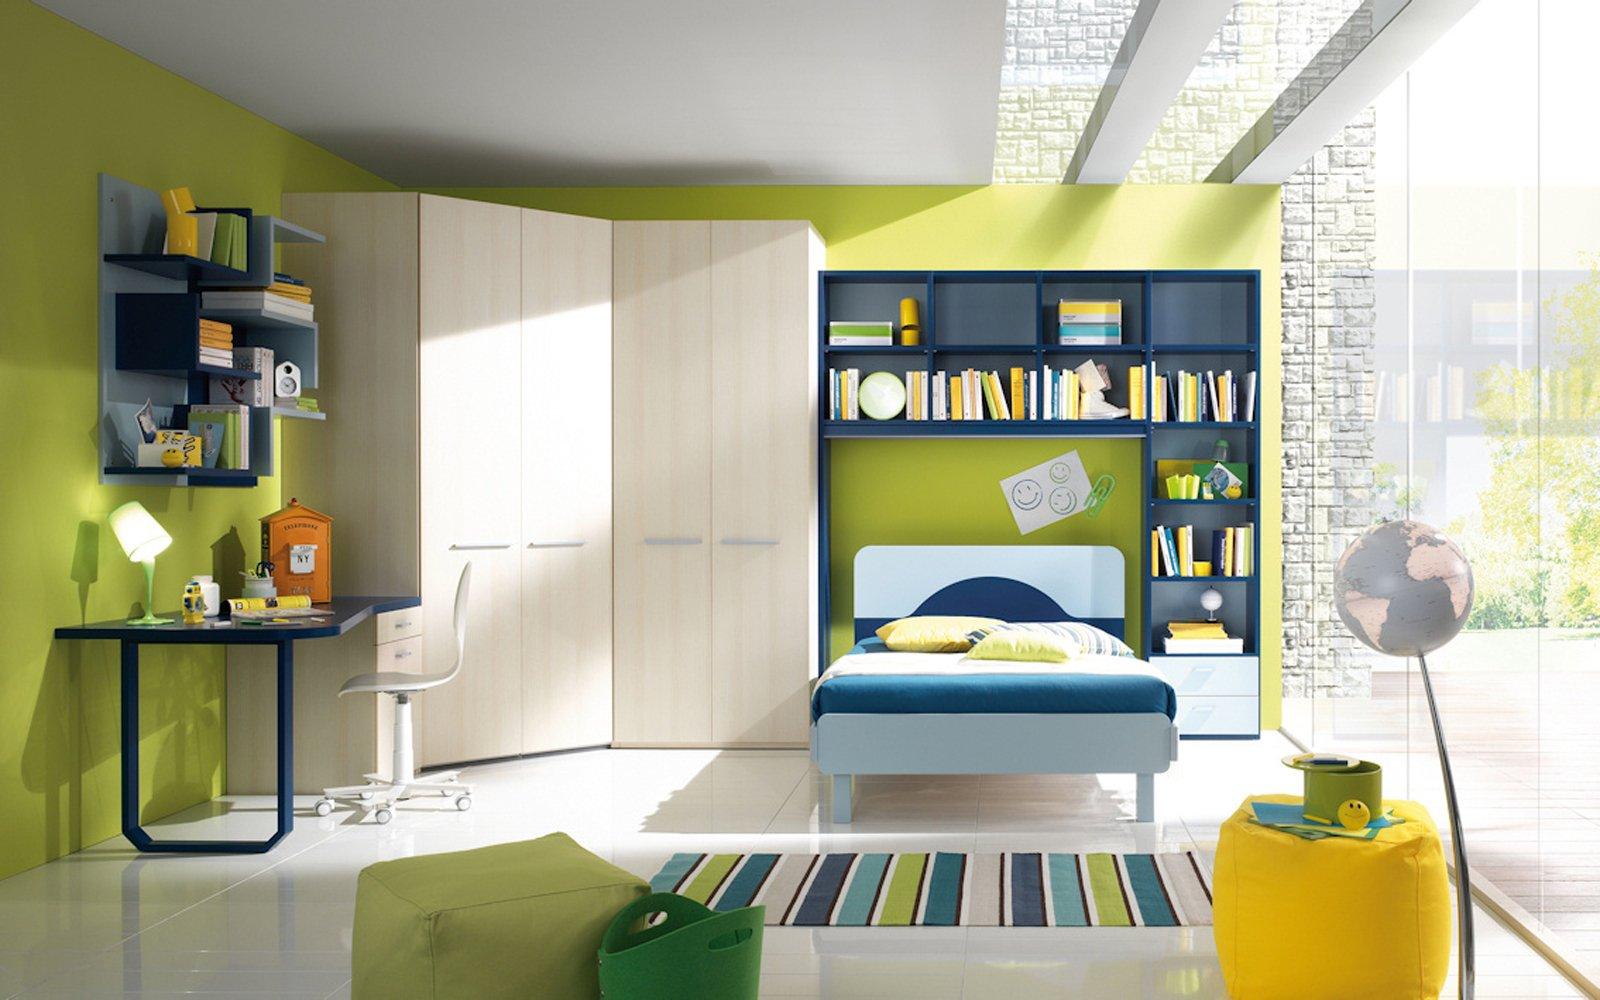 Camerette funzionalit a misura di bambino cose di casa for Camerette teenager